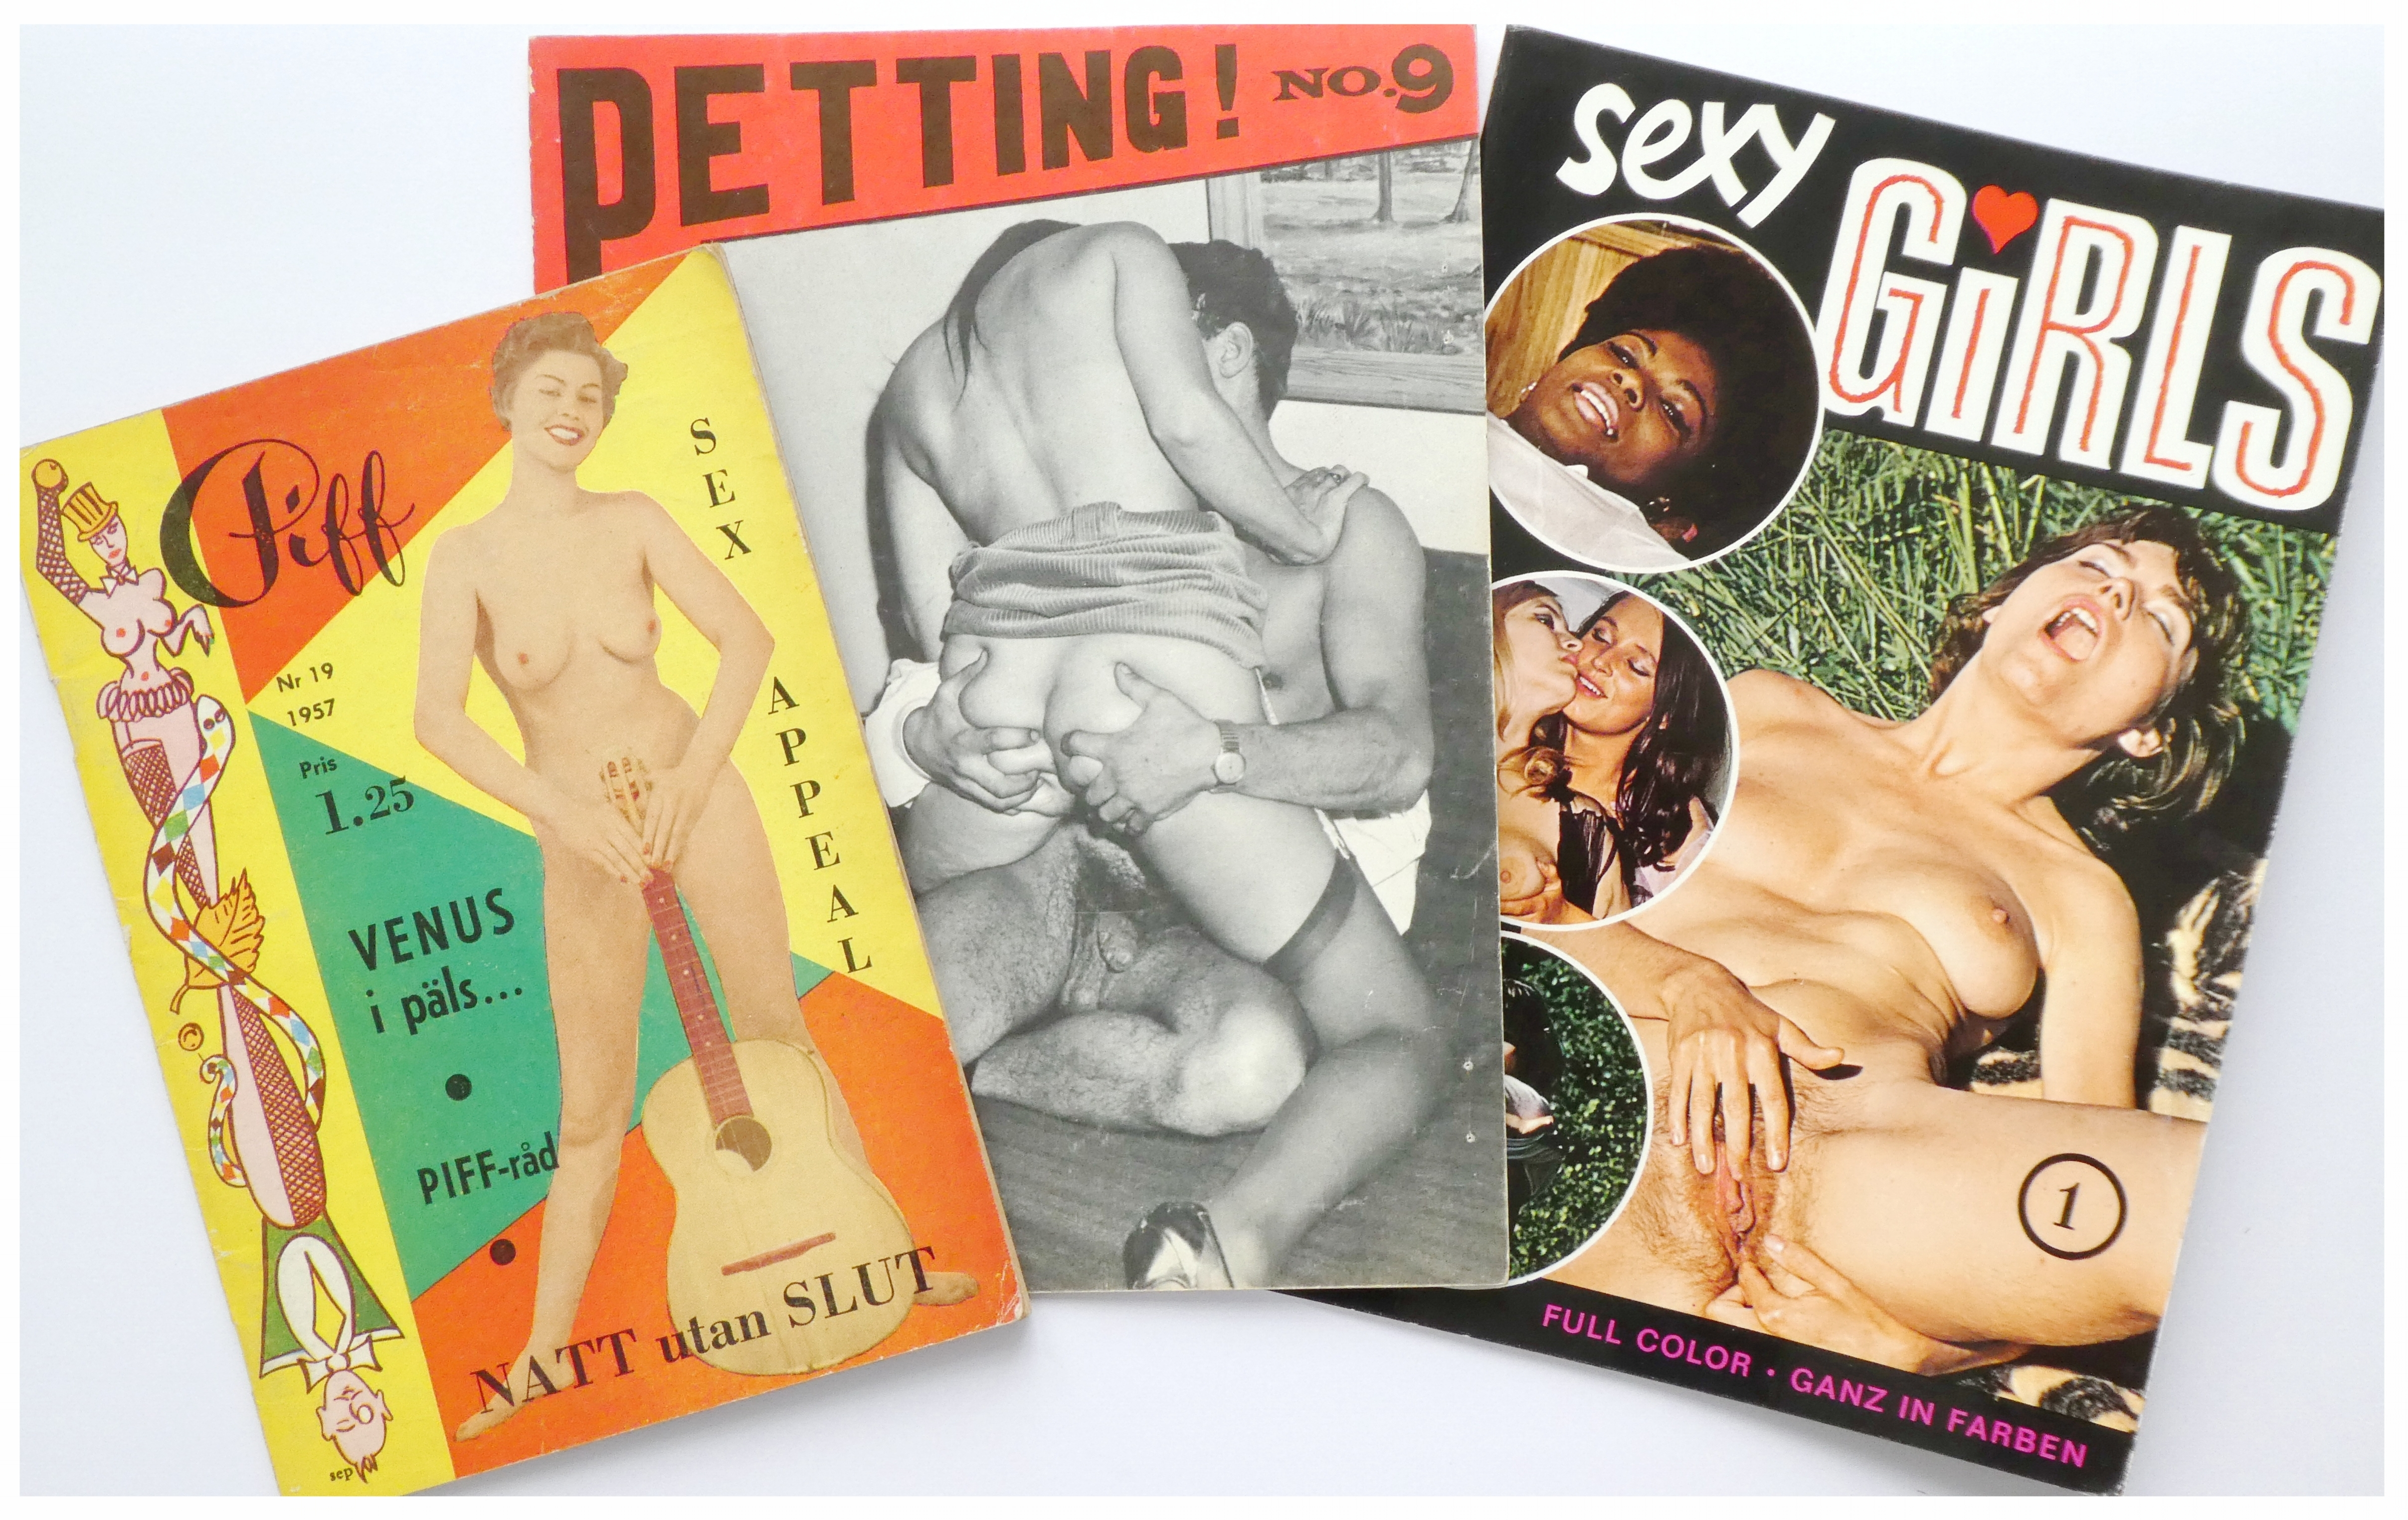 Petting, 'lesbian' and softcore magazines